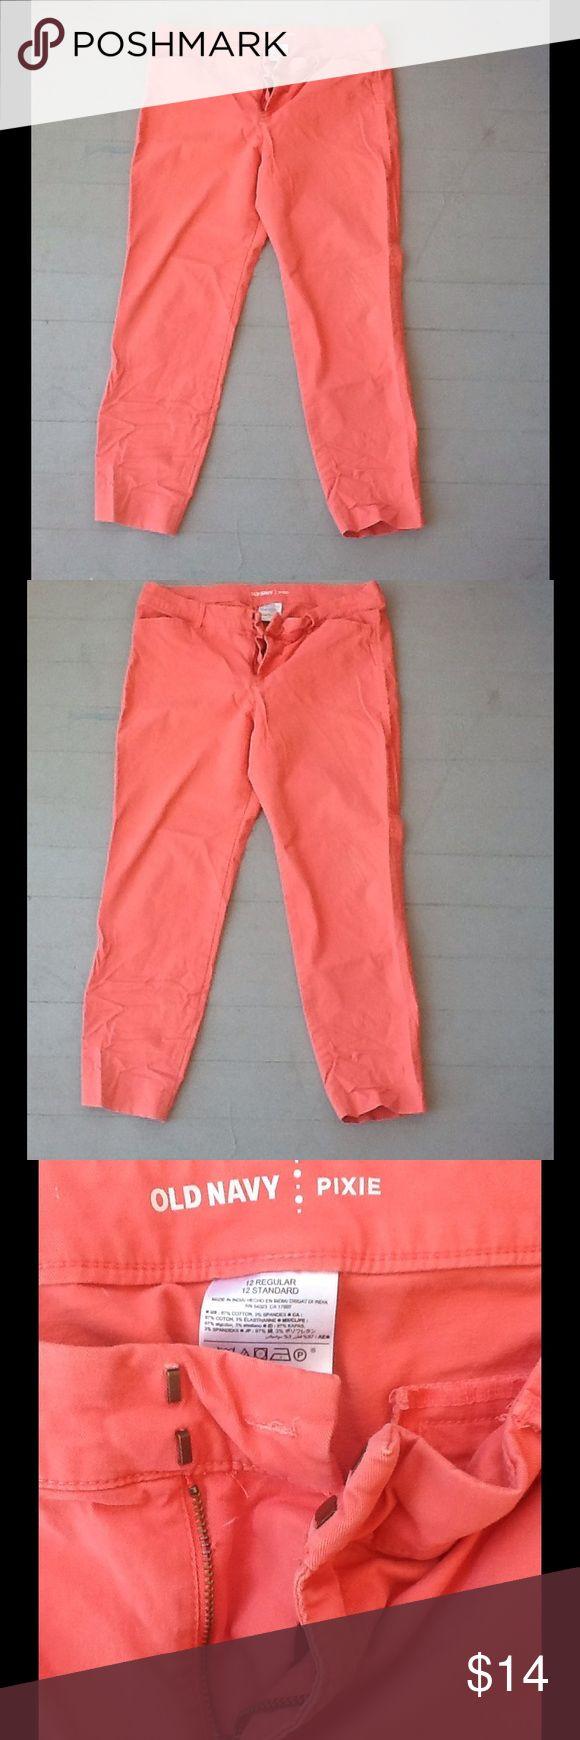 Salmon pants Salmon colored ankle length pants * 20% OFF 2+ BUNDLES * Old Navy Pants